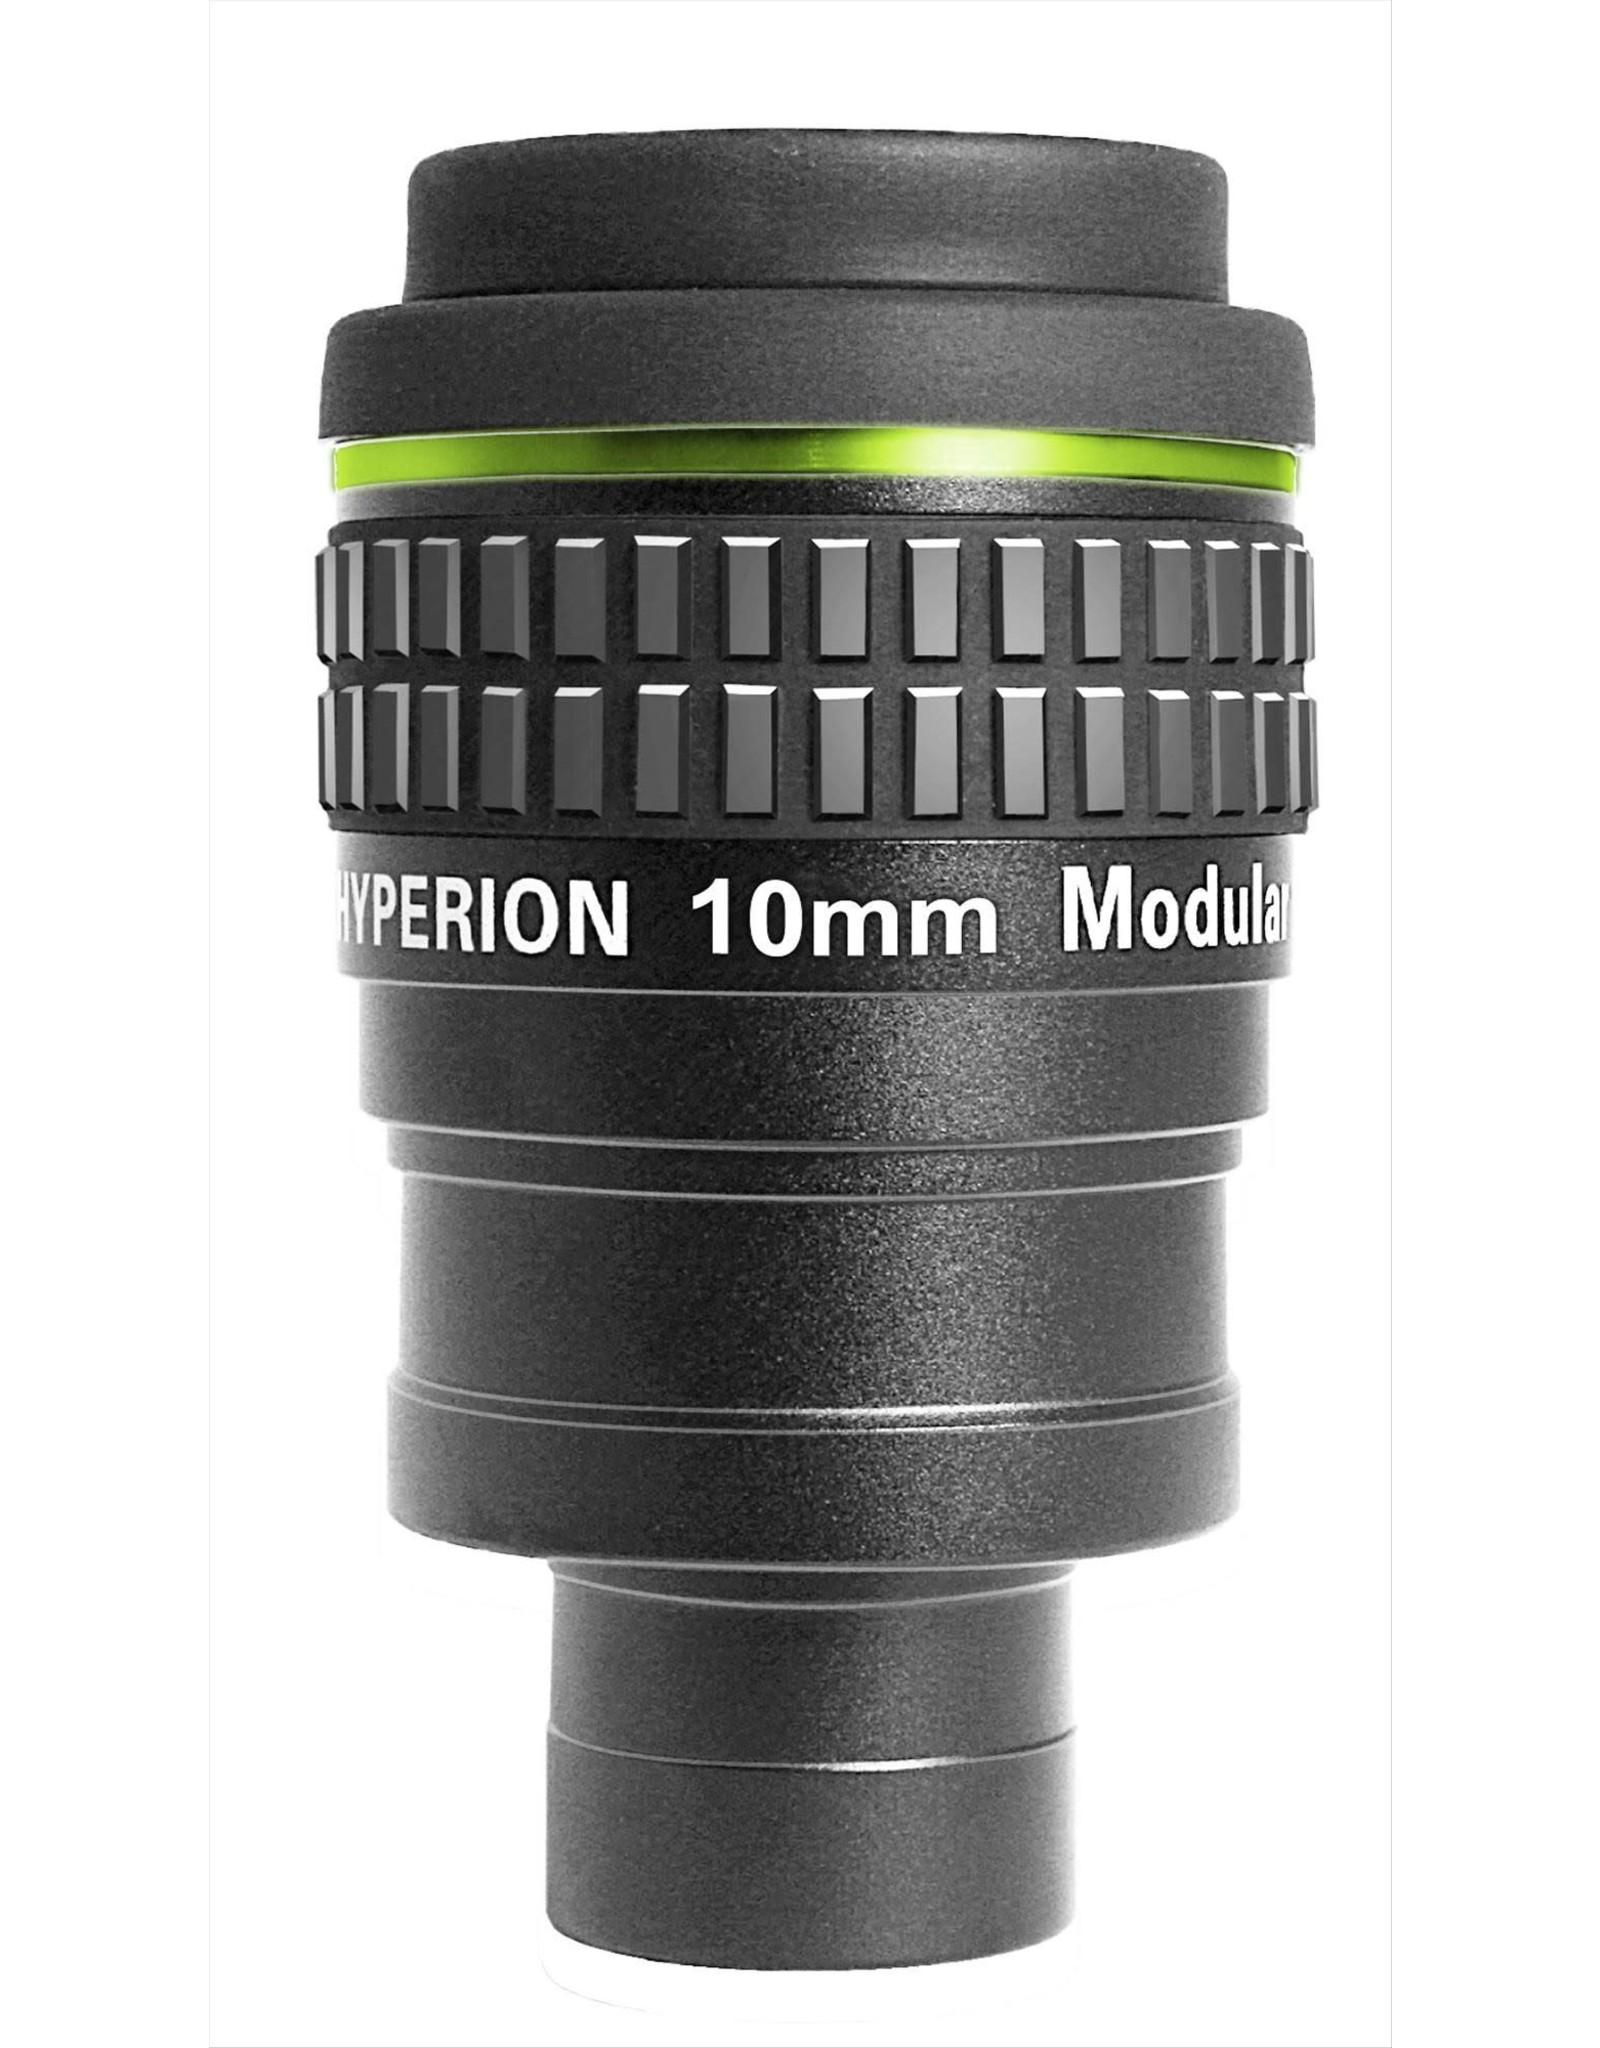 Baader Planetarium Baader Hyperion 68 Degree Modular Eyepiece 10mm